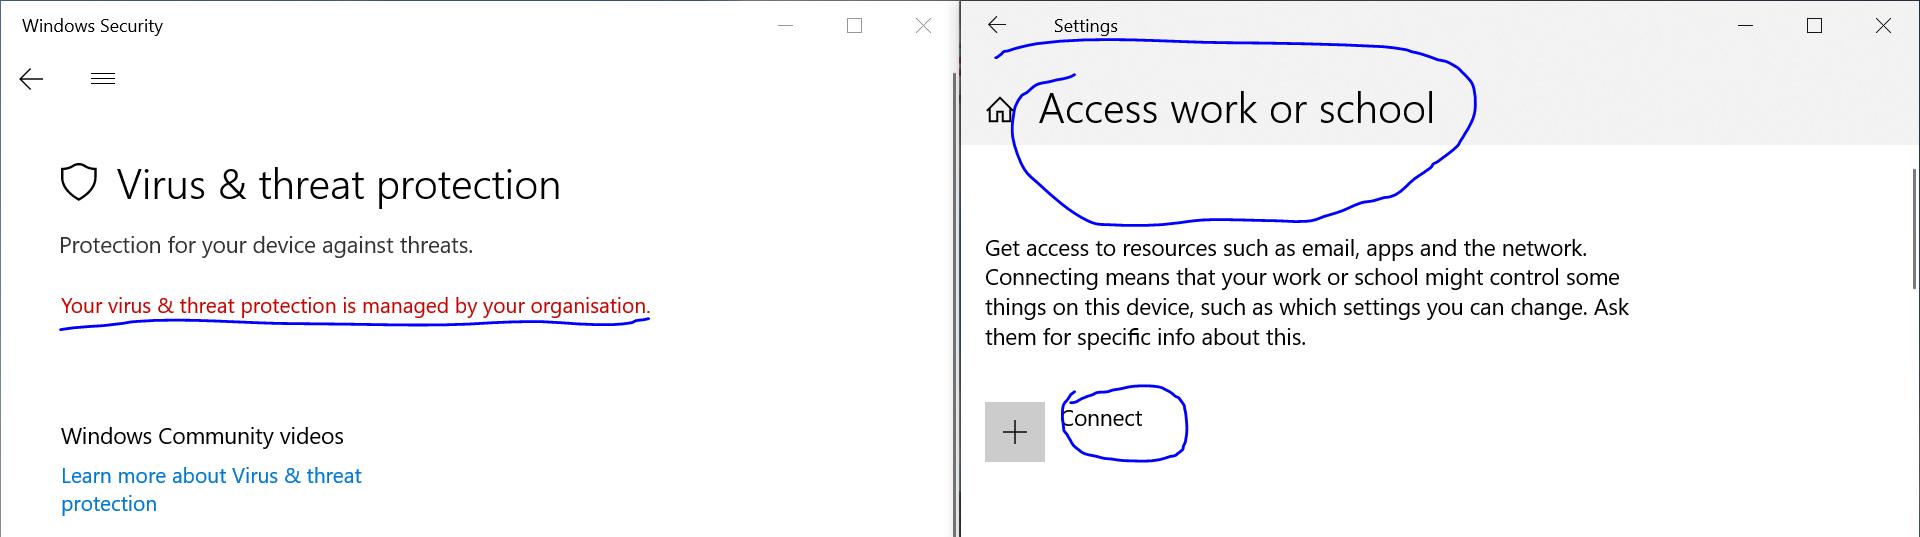 Windows Locked Sercurity Details 8d1a3007-e094-4376-9b0a-949b6d4584e9?upload=true.png